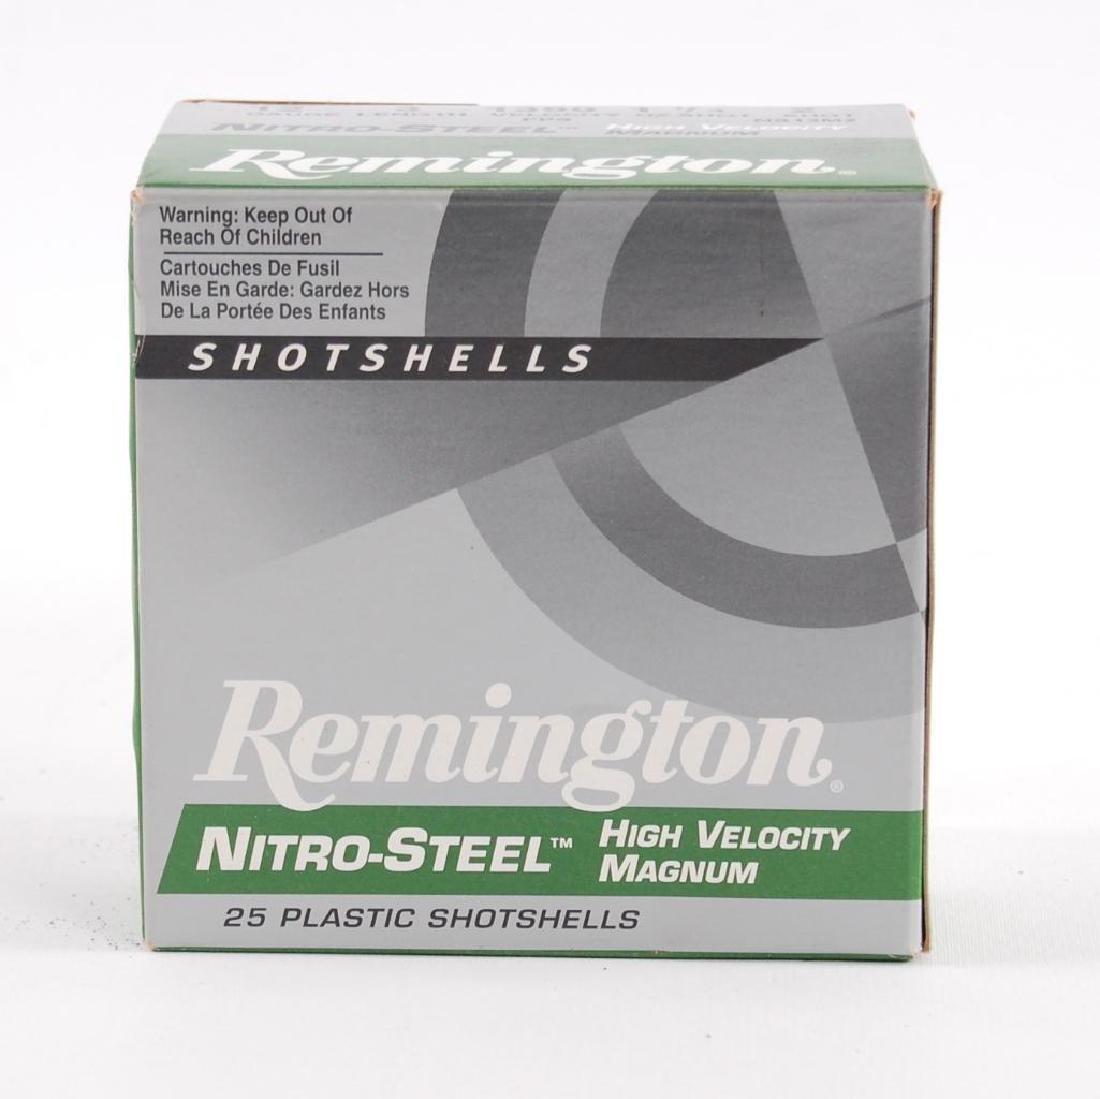 Full Box of Remington Nitro Steel High Celocity Magnum